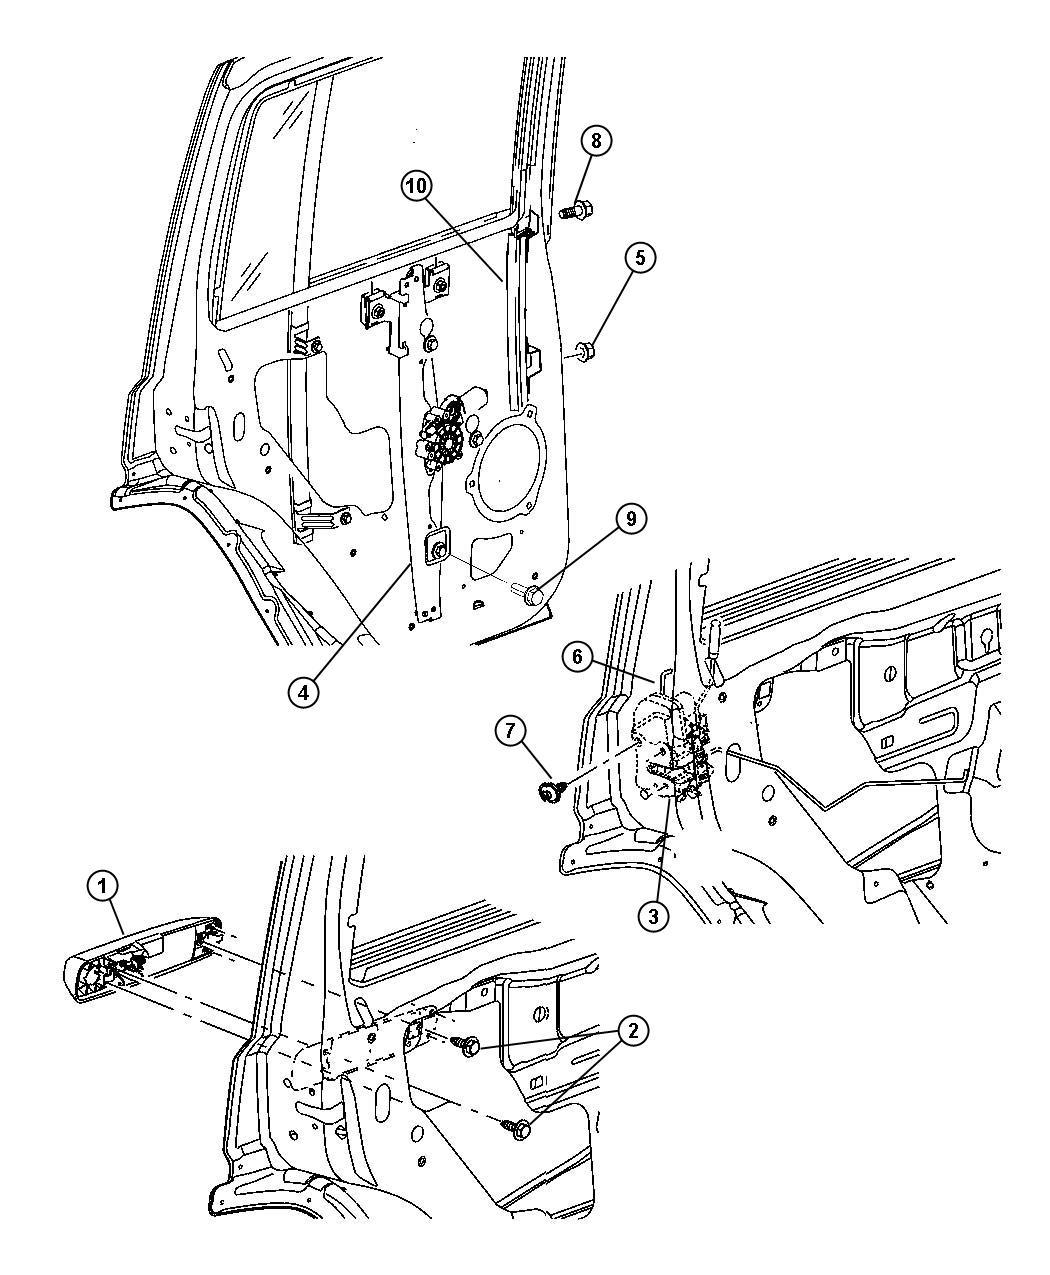 Jeep Commander Latch Rear Door Without Sales Code